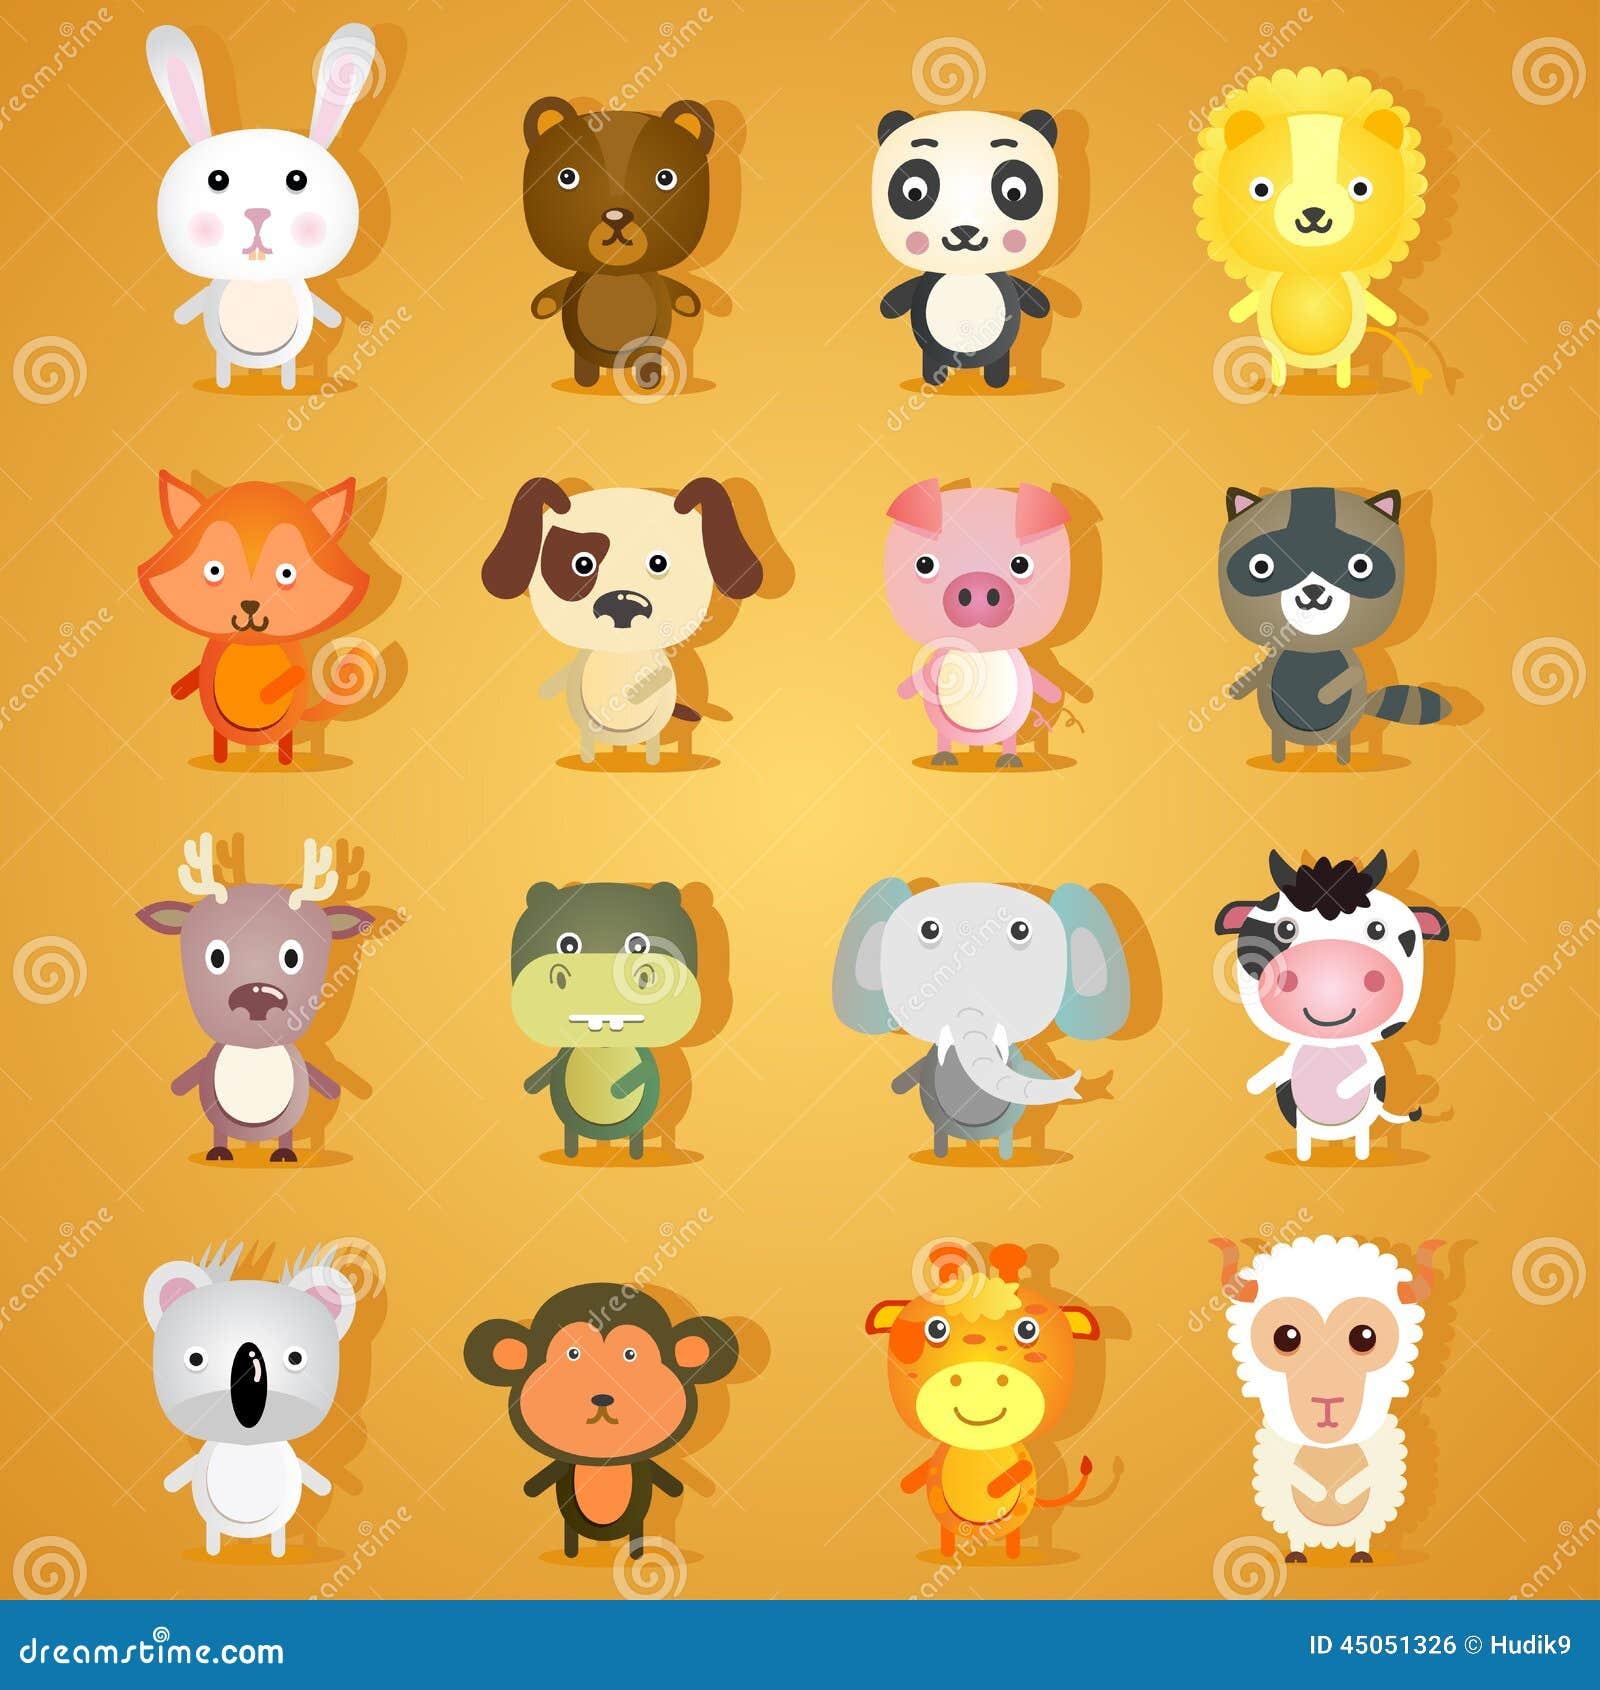 set of cartoon animal characters stock vector image. Black Bedroom Furniture Sets. Home Design Ideas